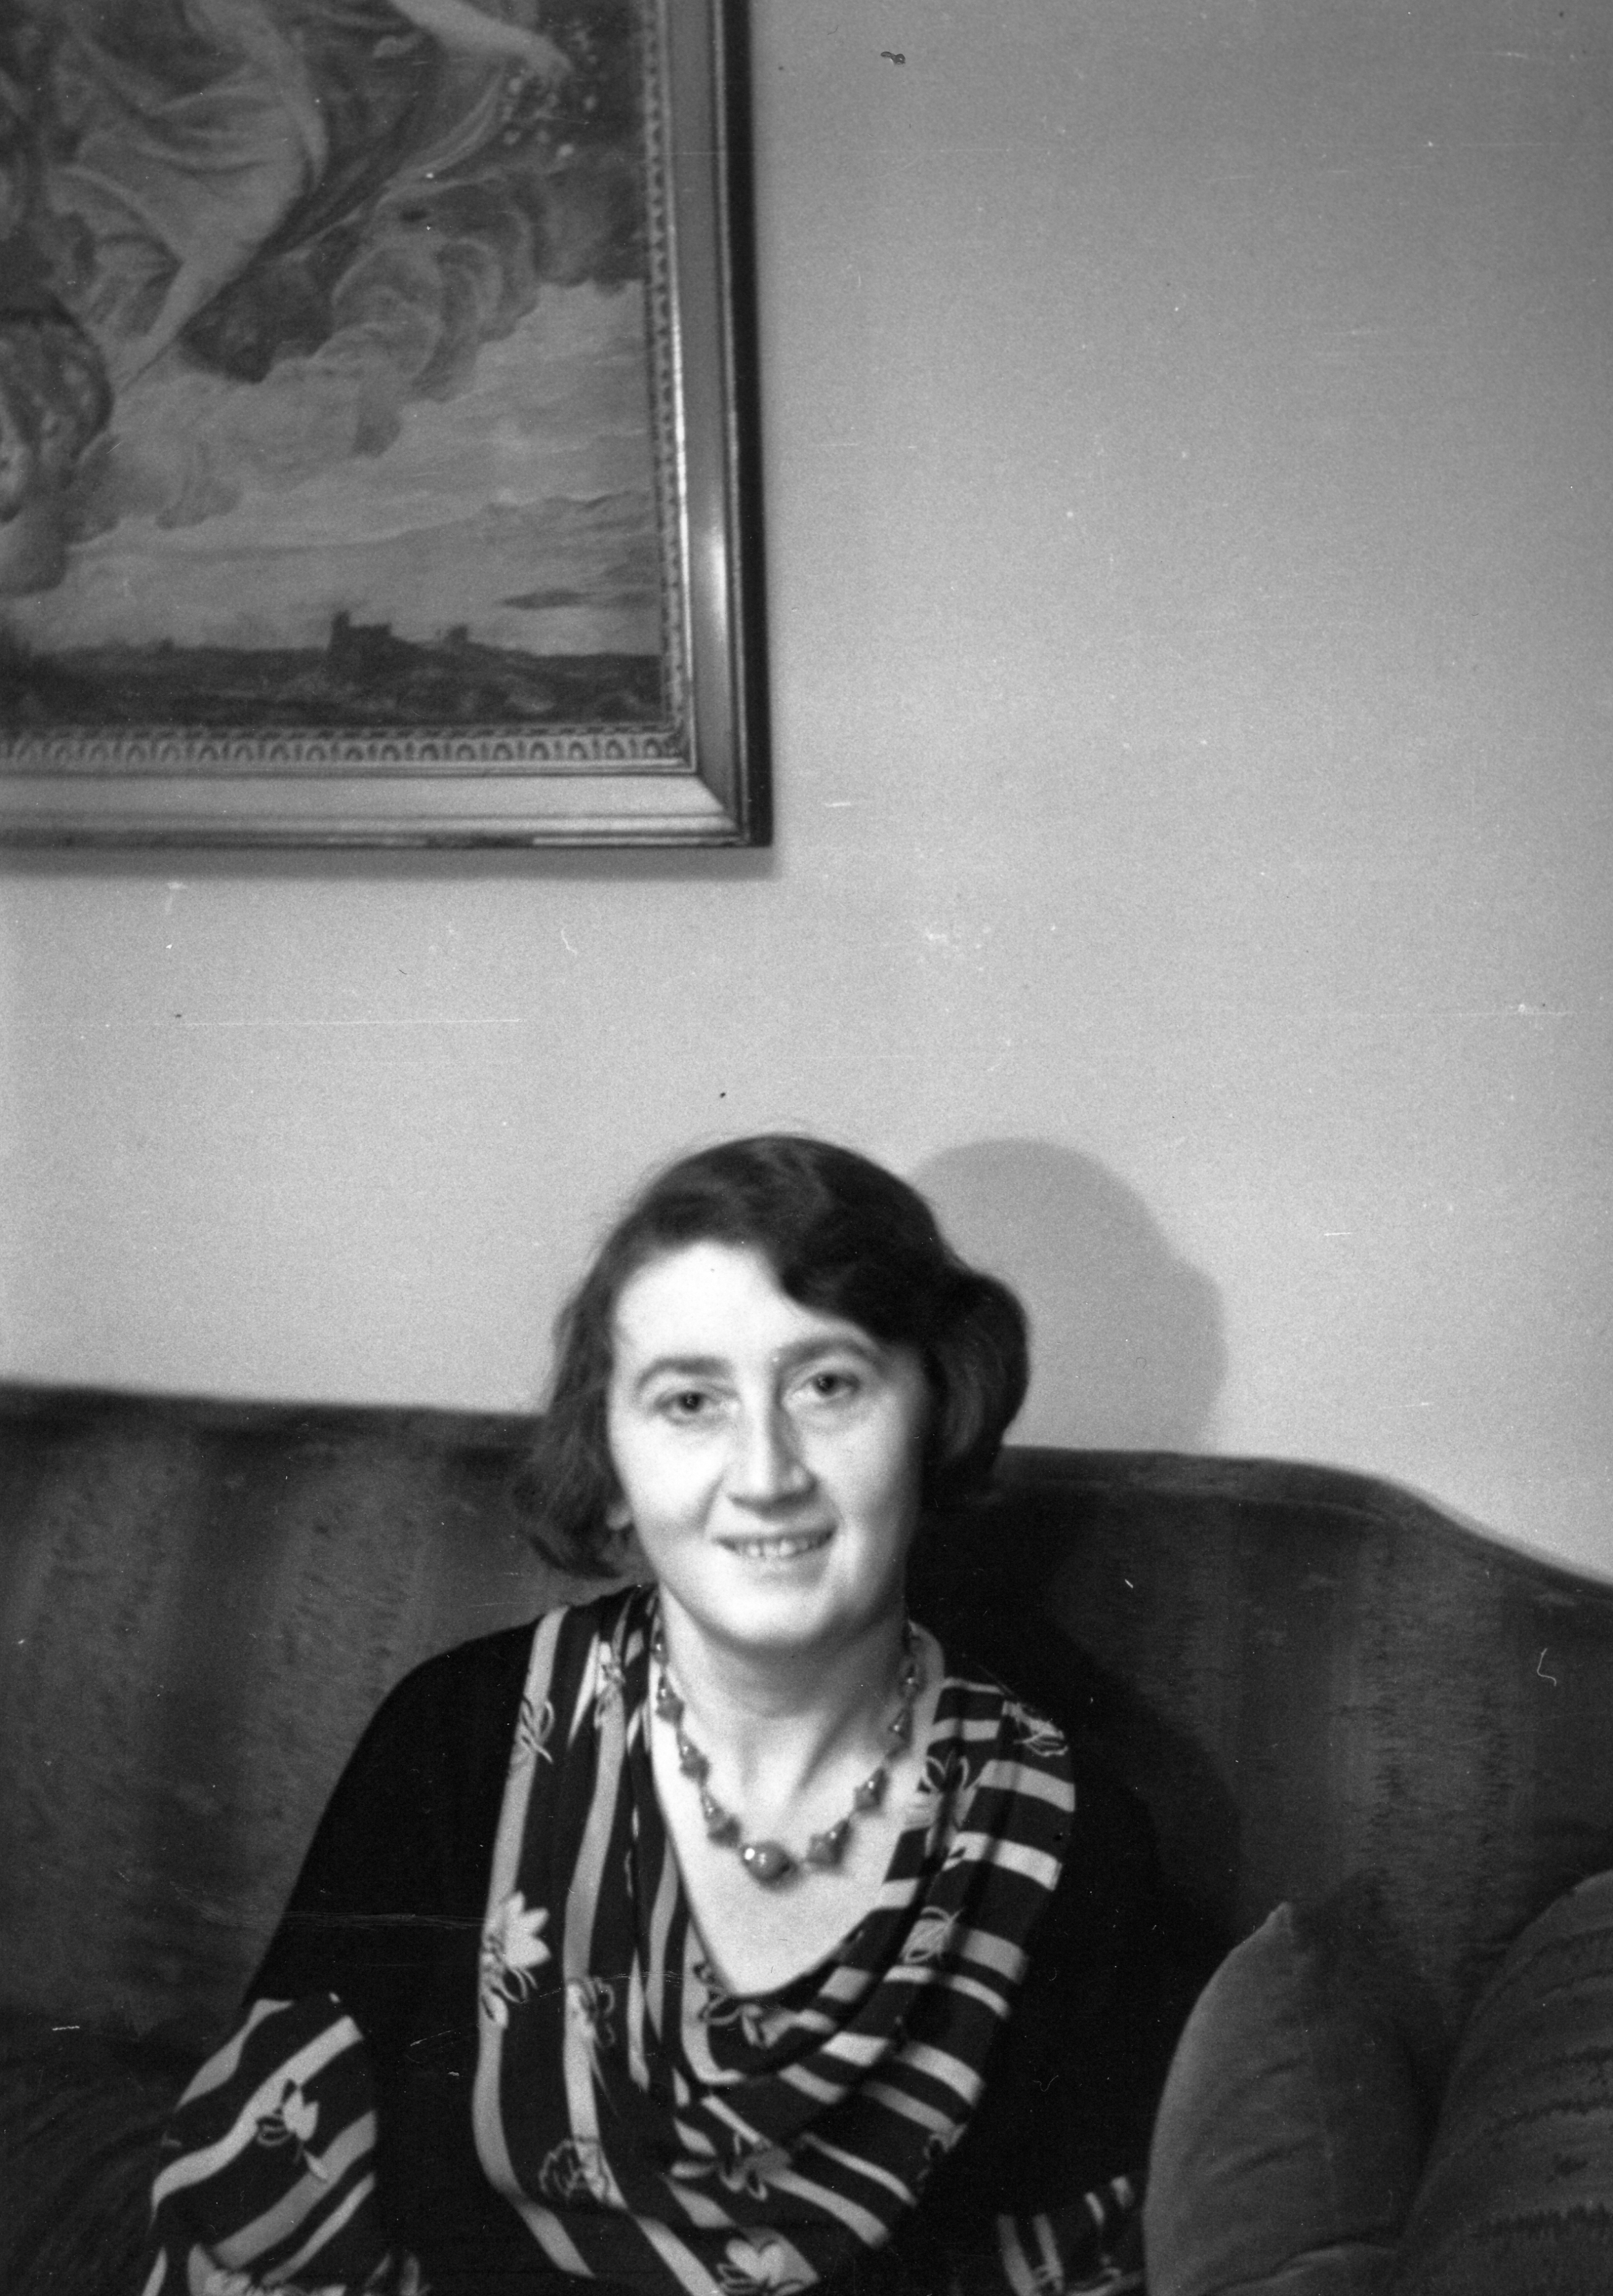 Informal portrait of Betty Schultz sitting on a sofa.